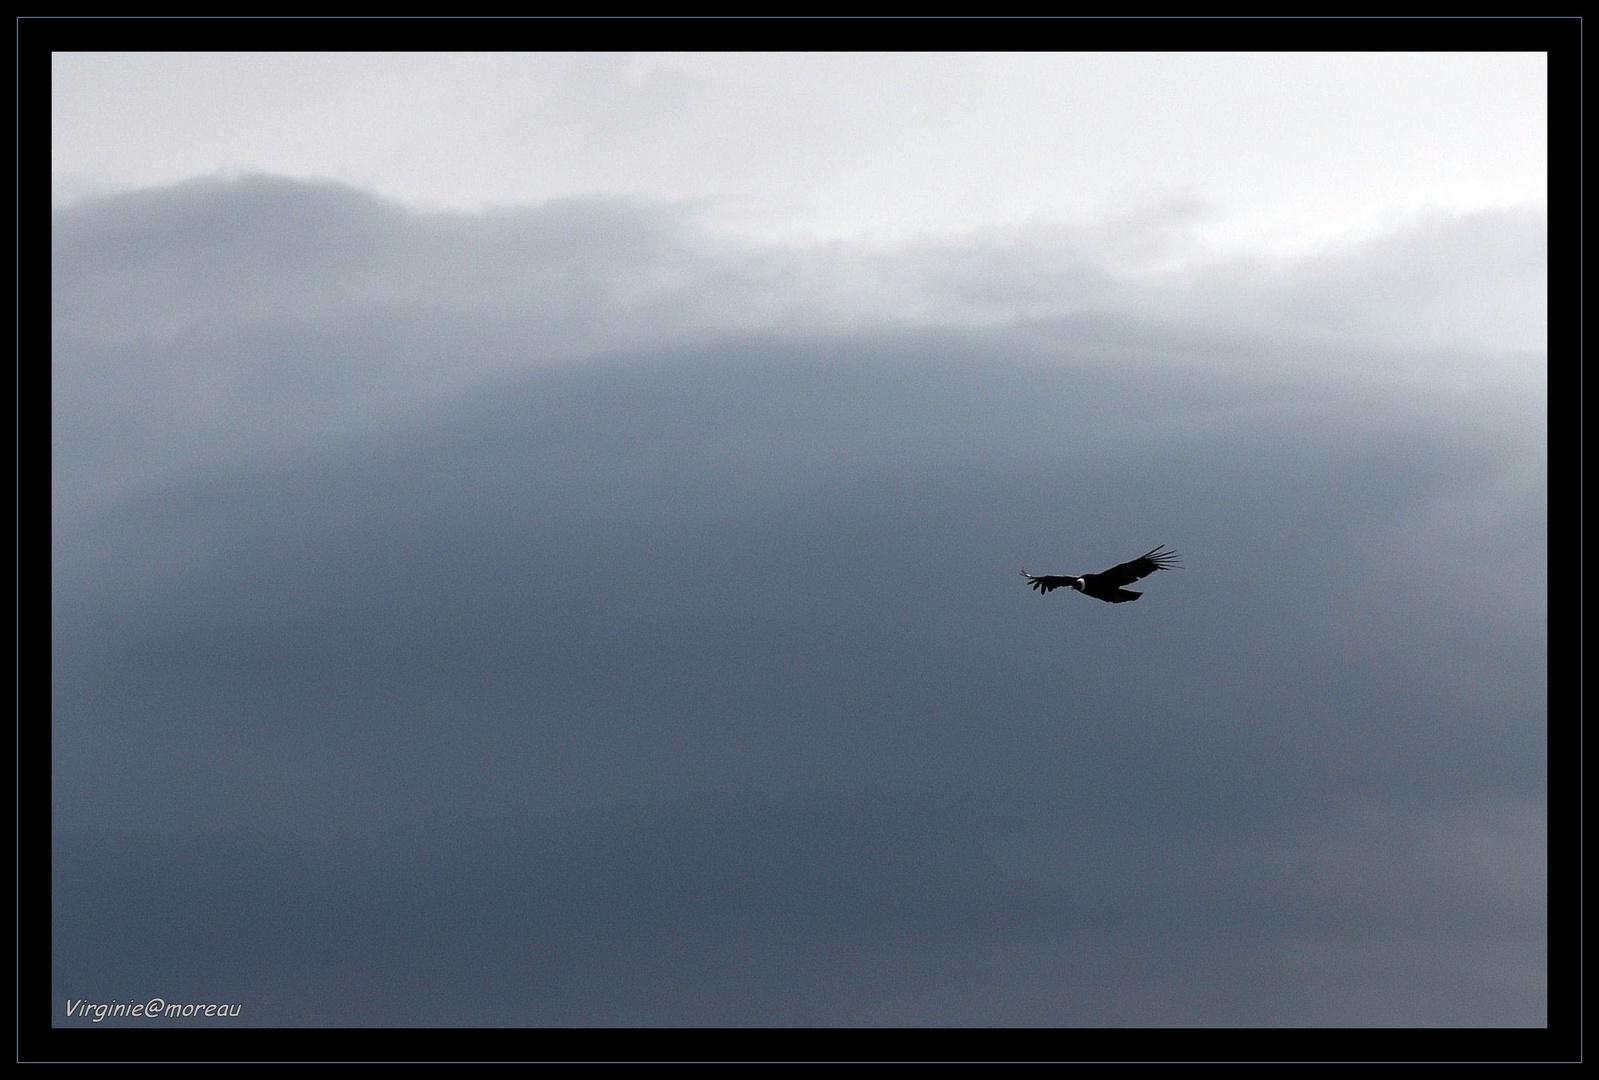 Sa majesté le Condor des Andes...